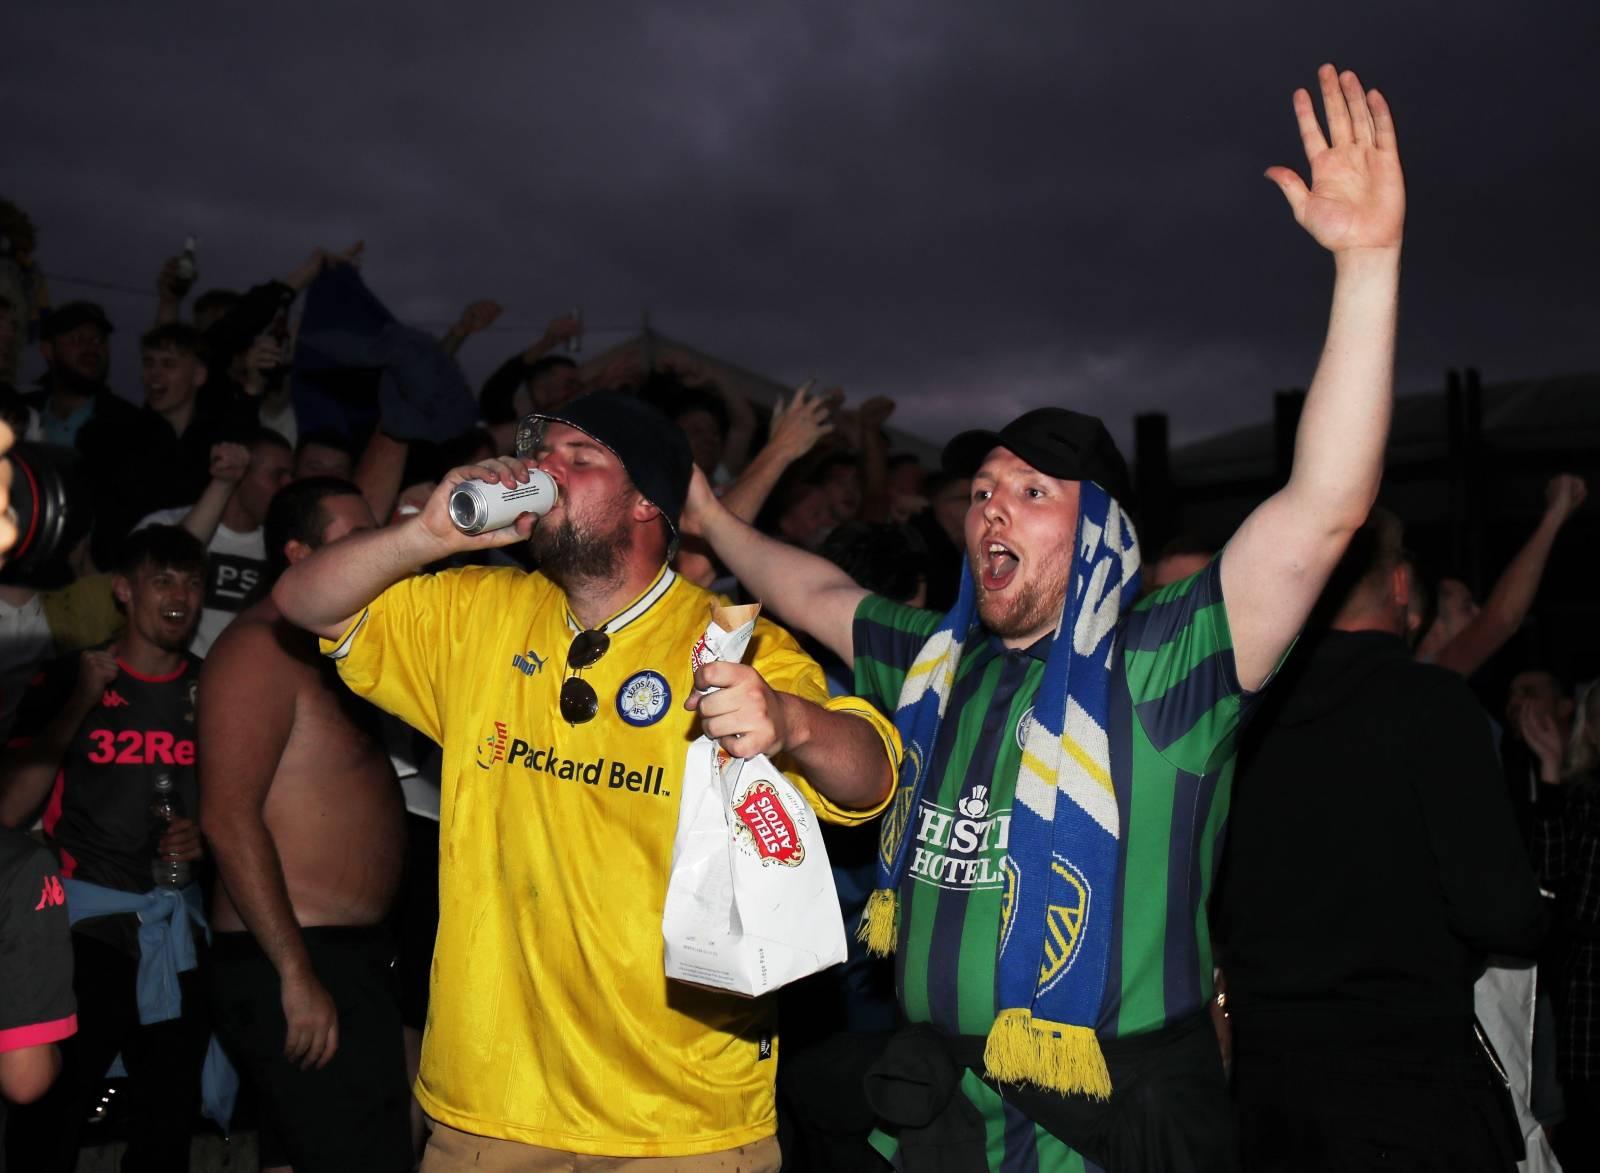 Championship - Leeds United celebrate promotion to the Premier League